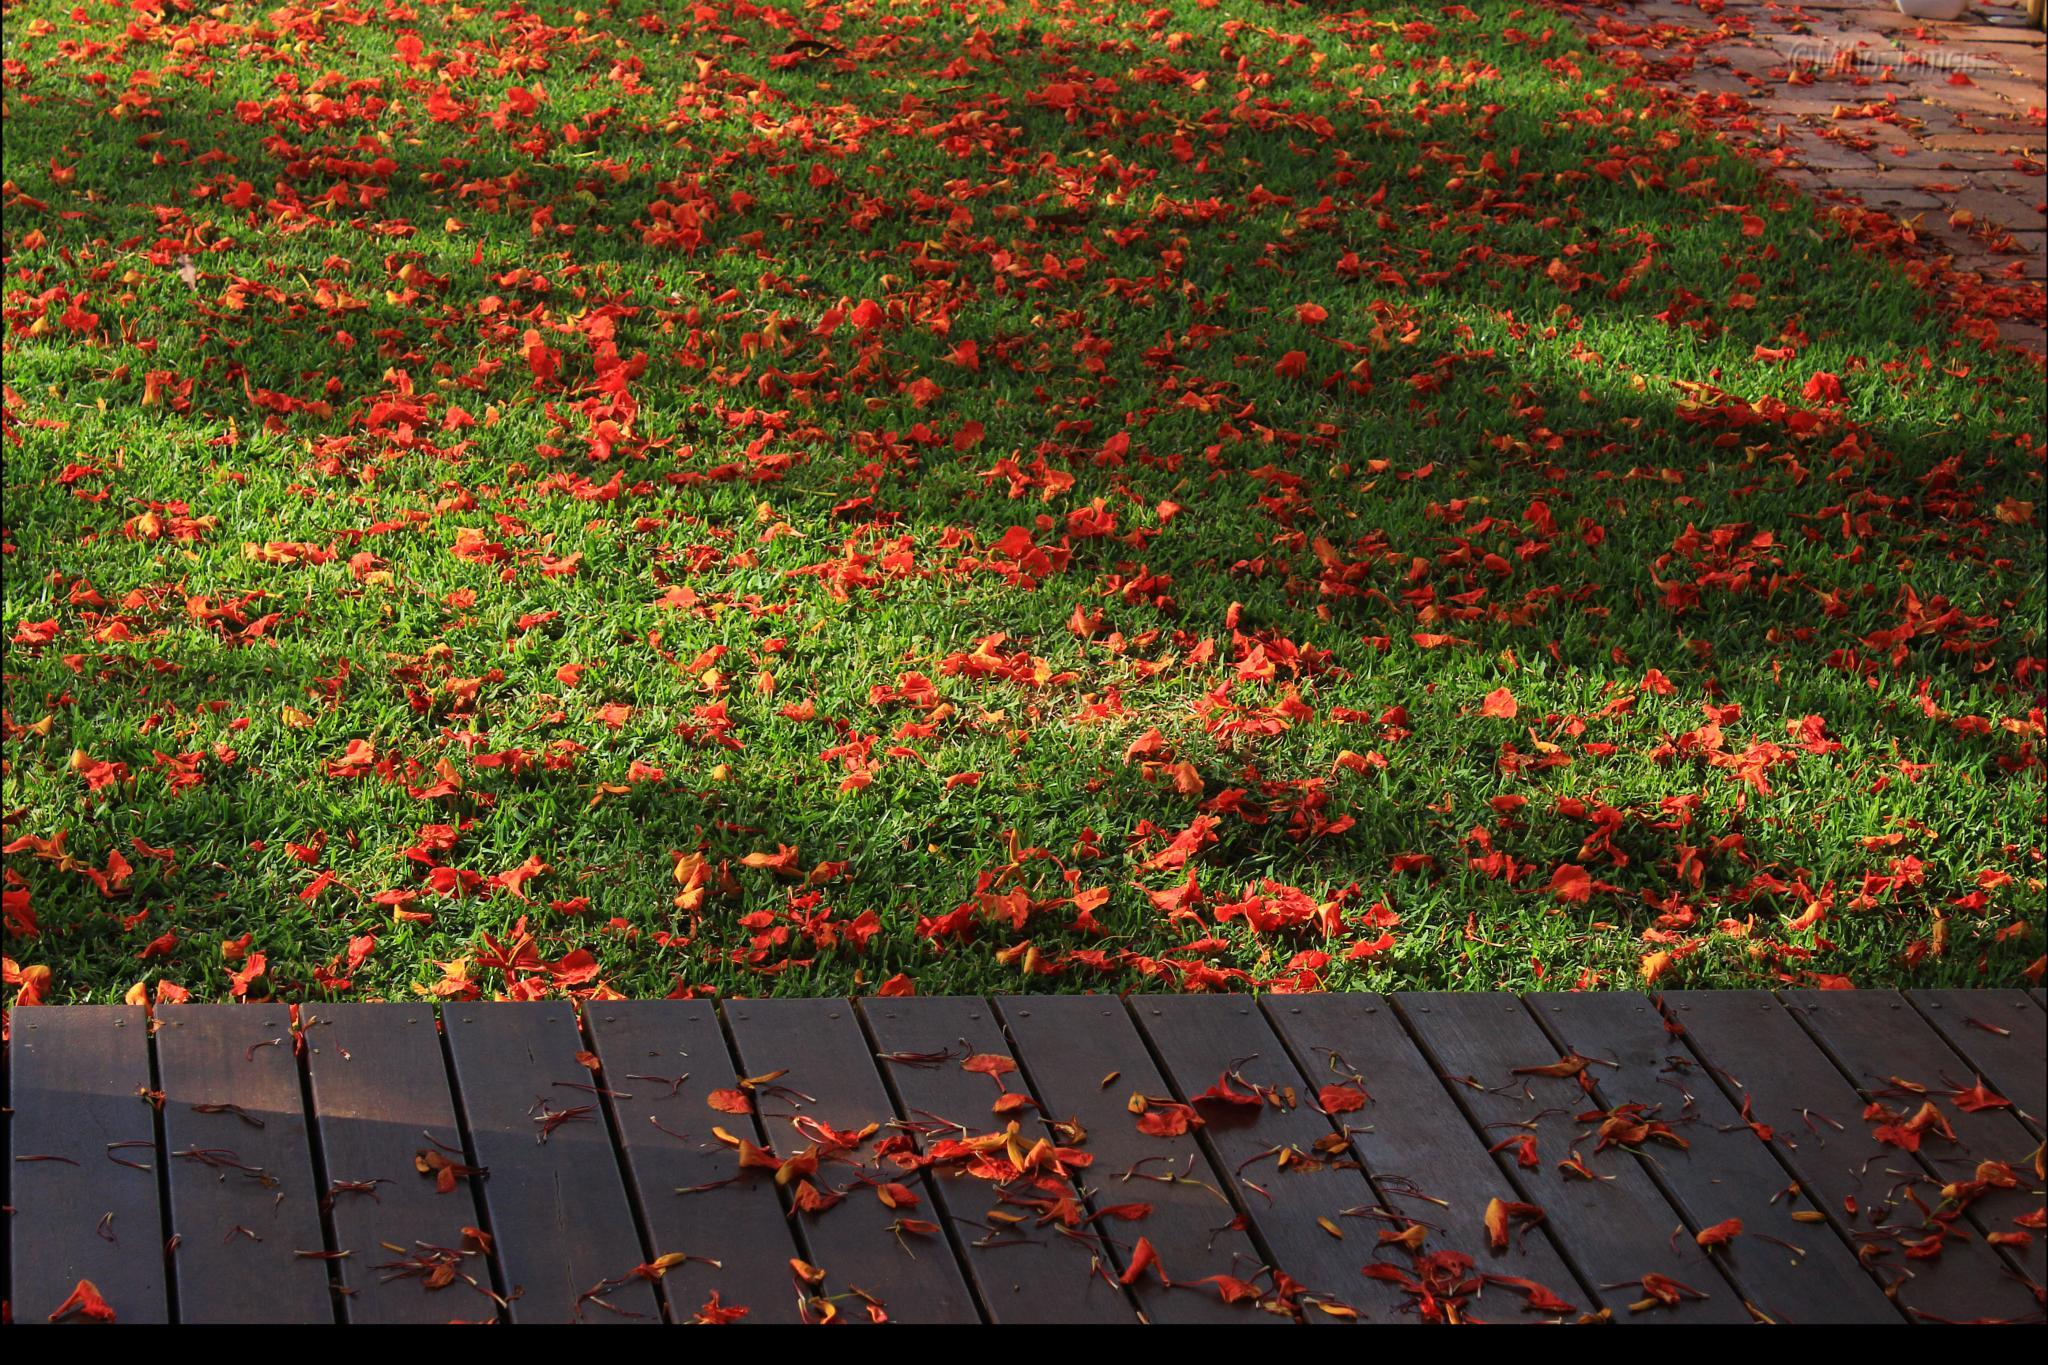 flower carpet by miho.james